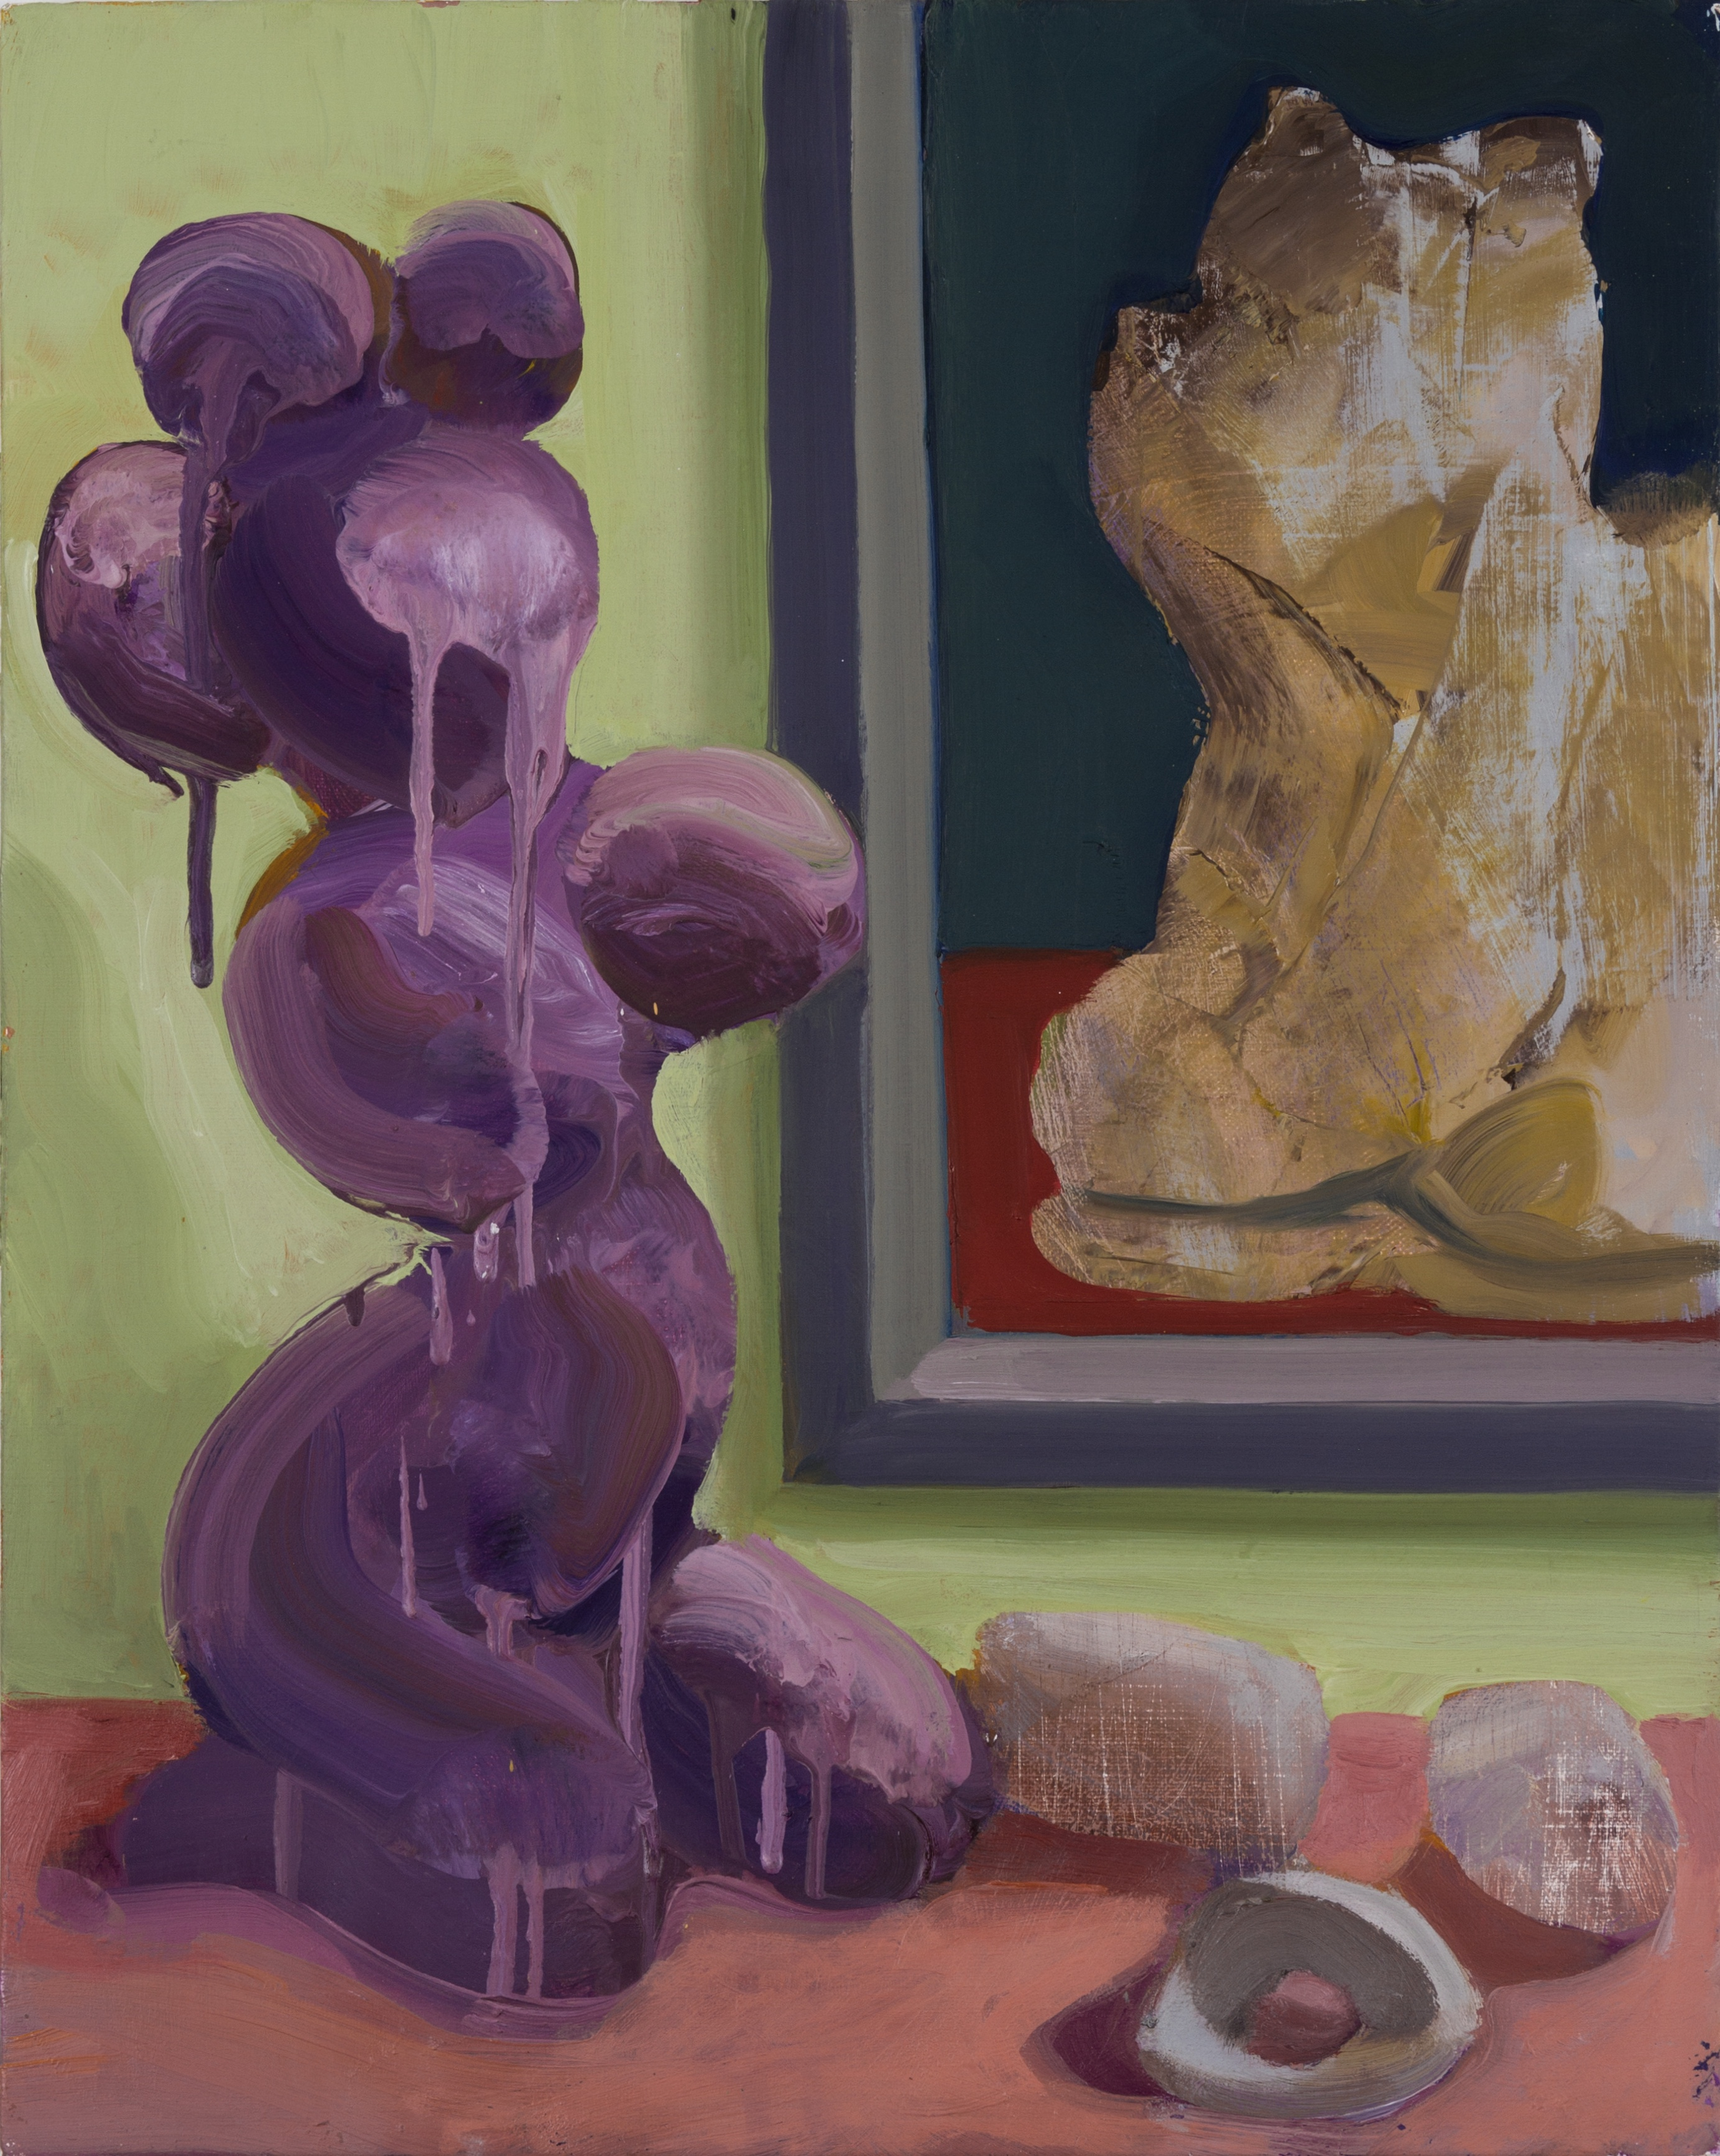 Painting Contemplates Sculpture